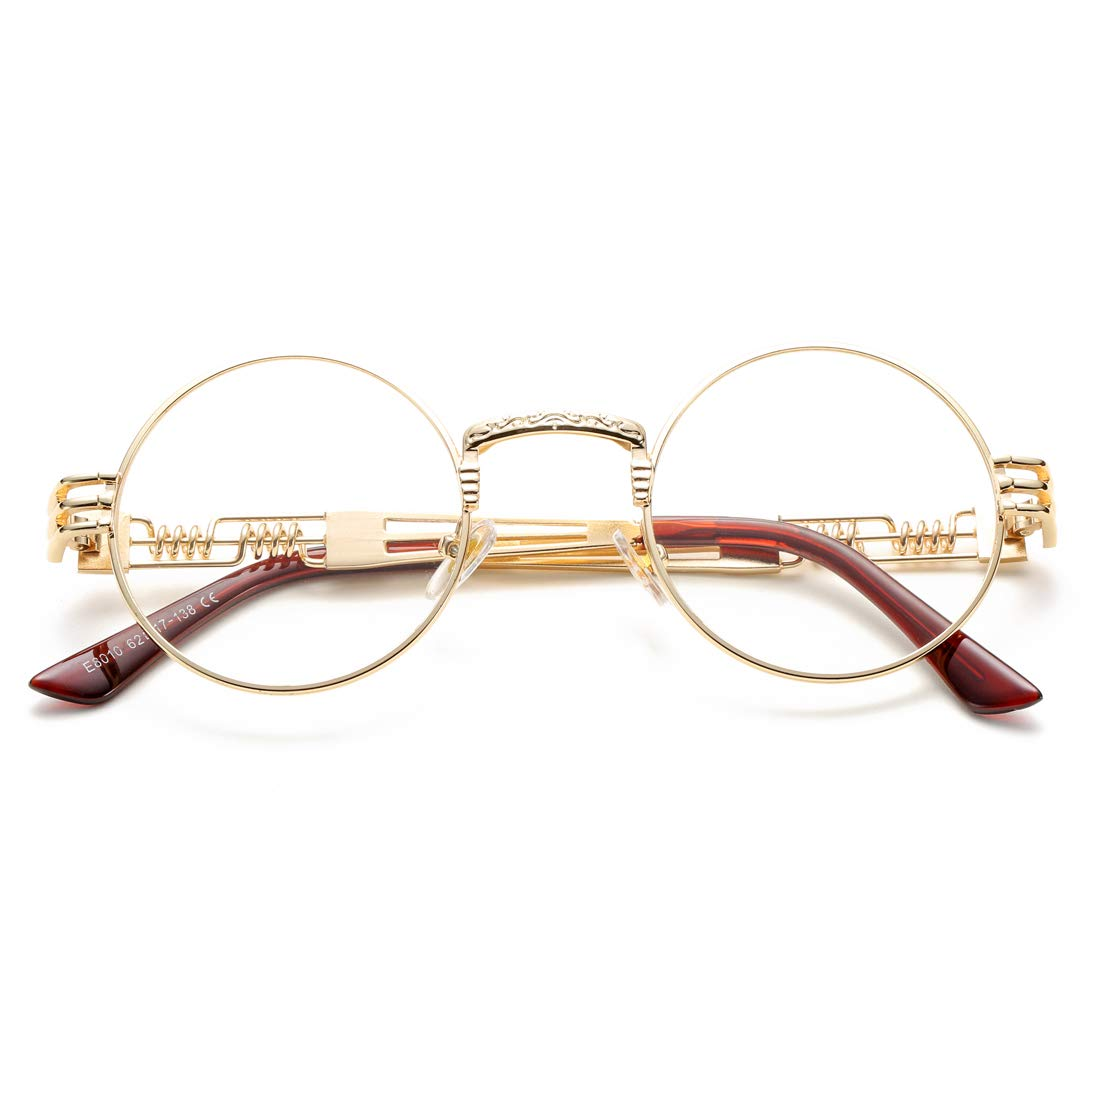 4f0cd03af8e Amazon.com  COASION Vintage Round John Lennon Sunglasses Steampunk Gold  Metal Frame Clear Sun Glasses (Gold Frame Clear Lens)  Shoes